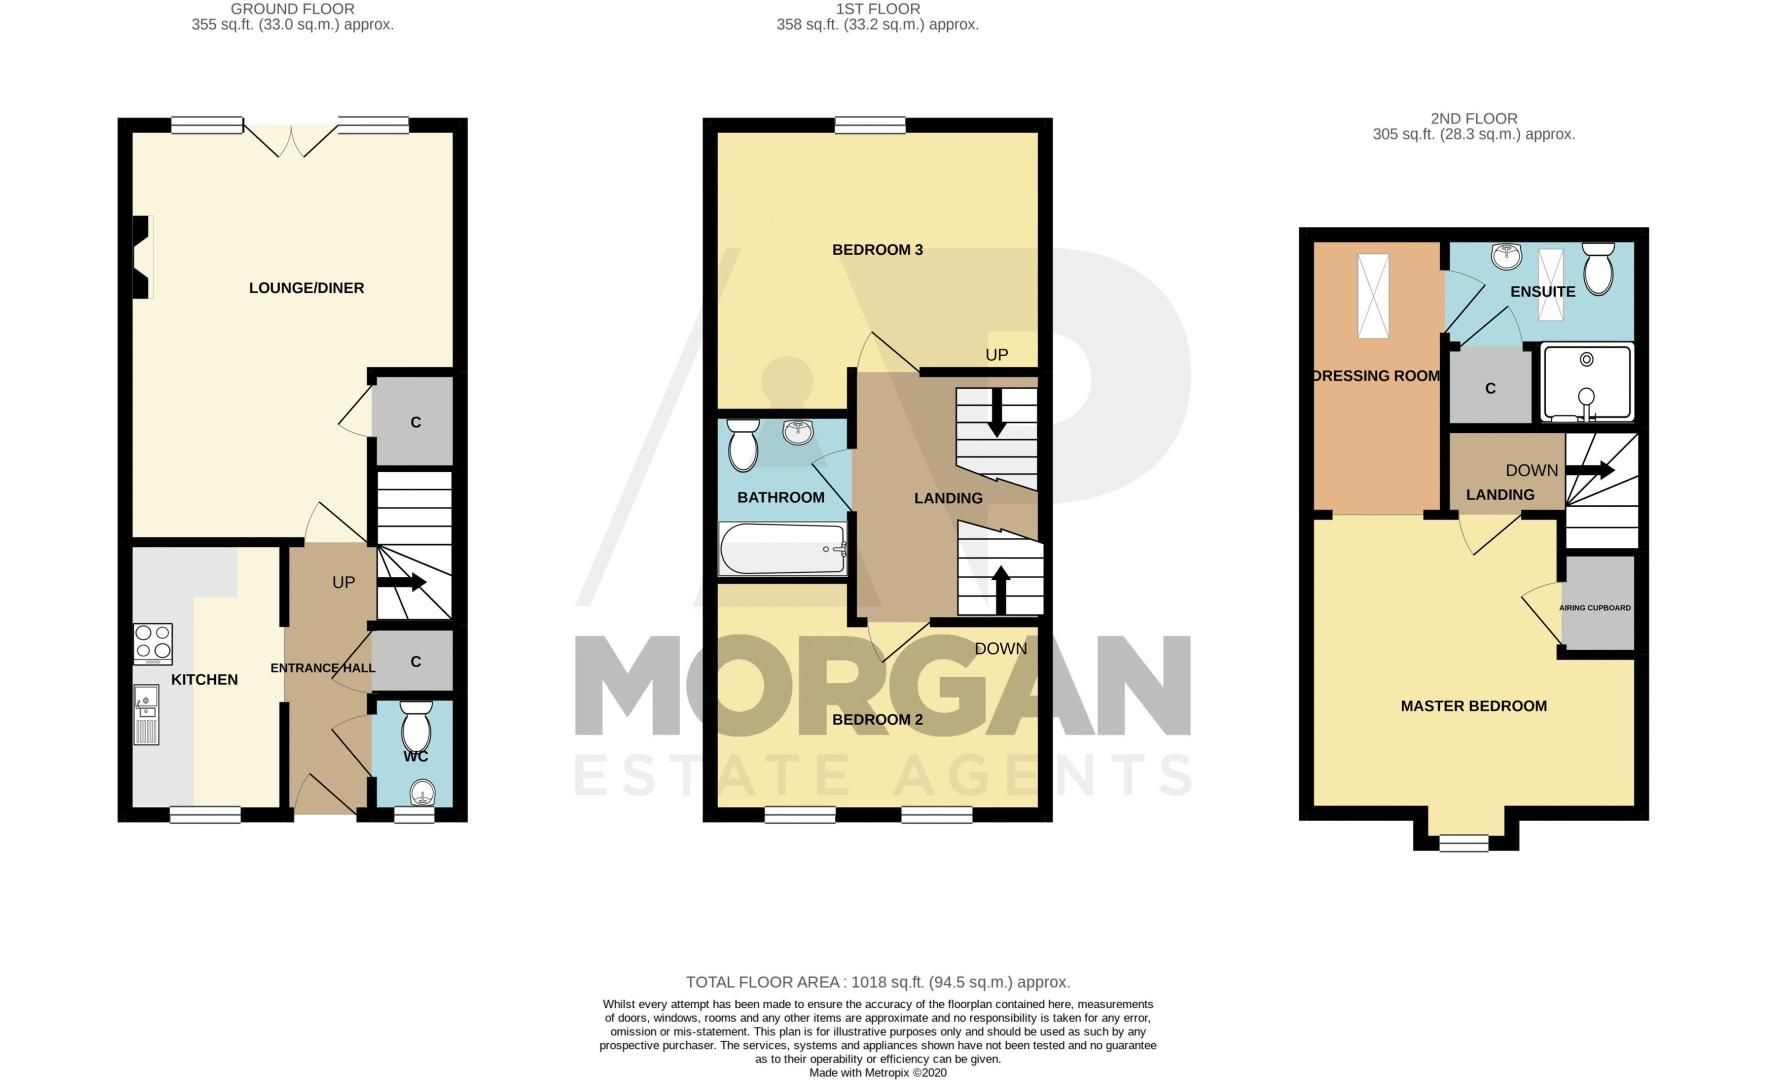 3 bed  for sale in Powke Lane - Property Floorplan